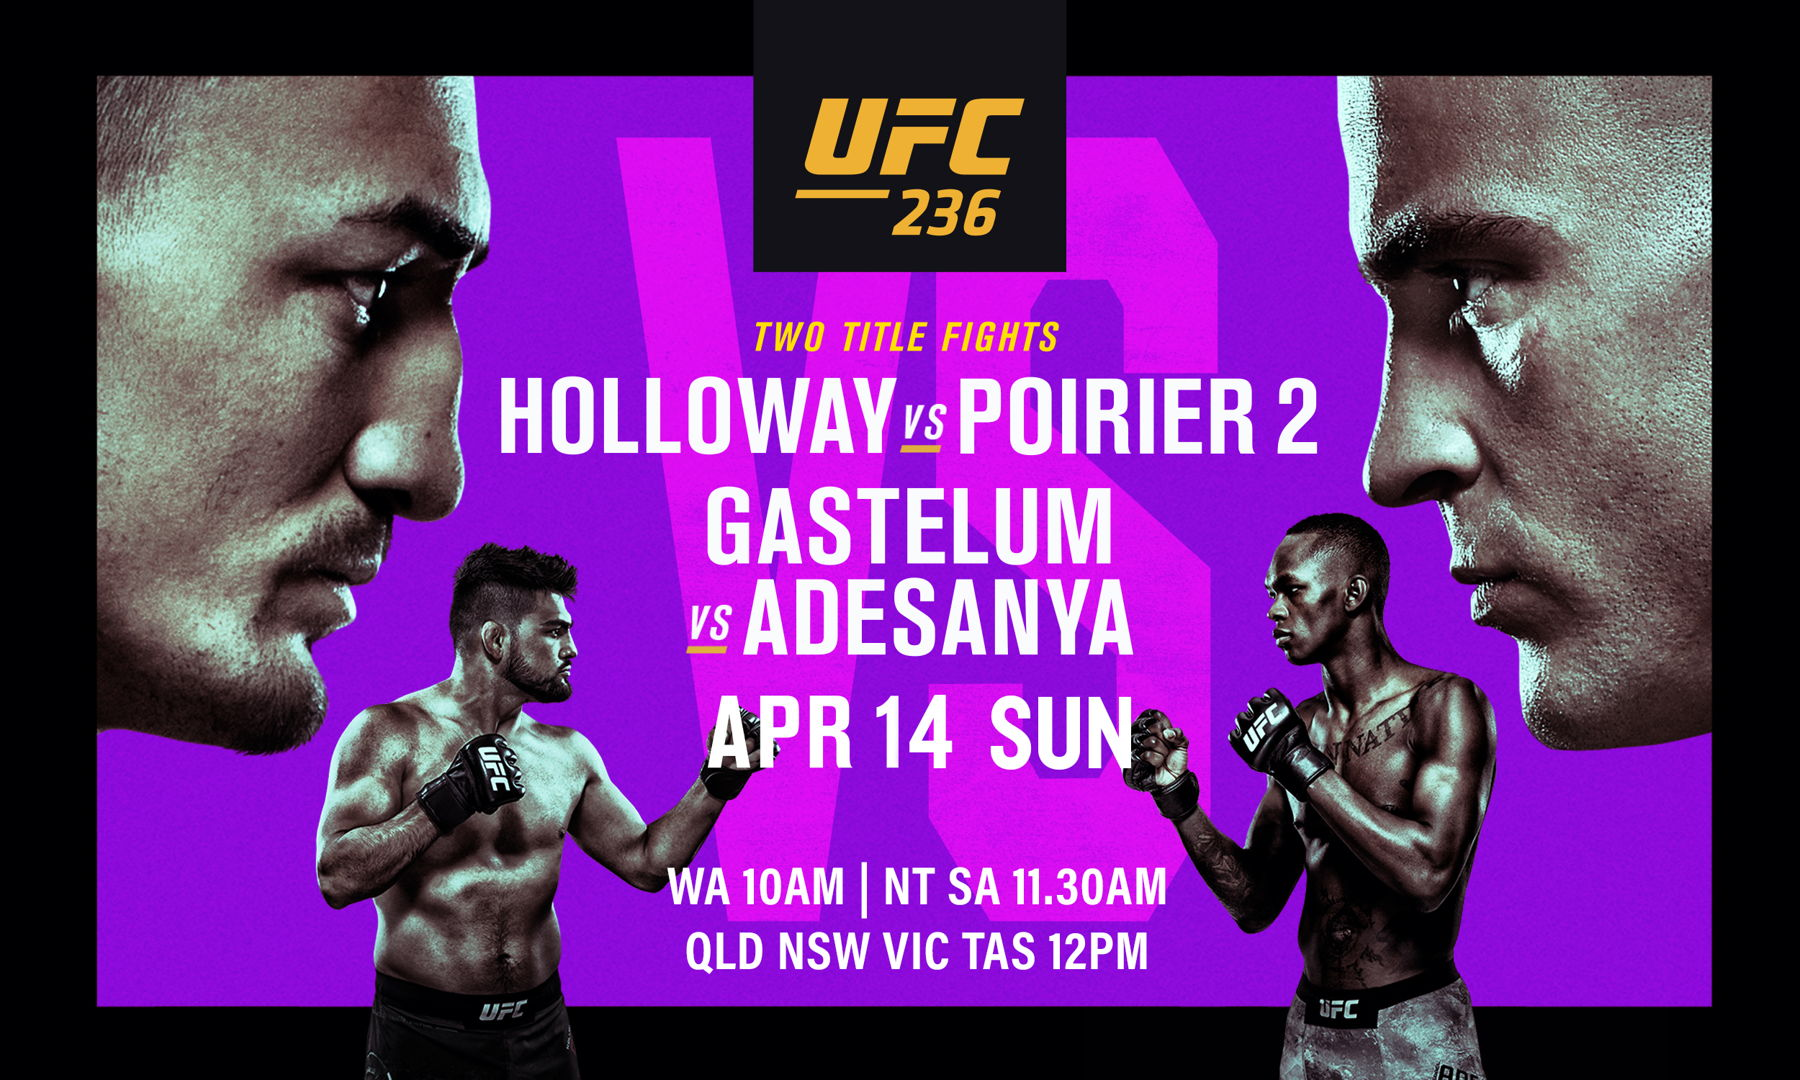 UFC_236_Banner_Better_At_The_Pub.jpg